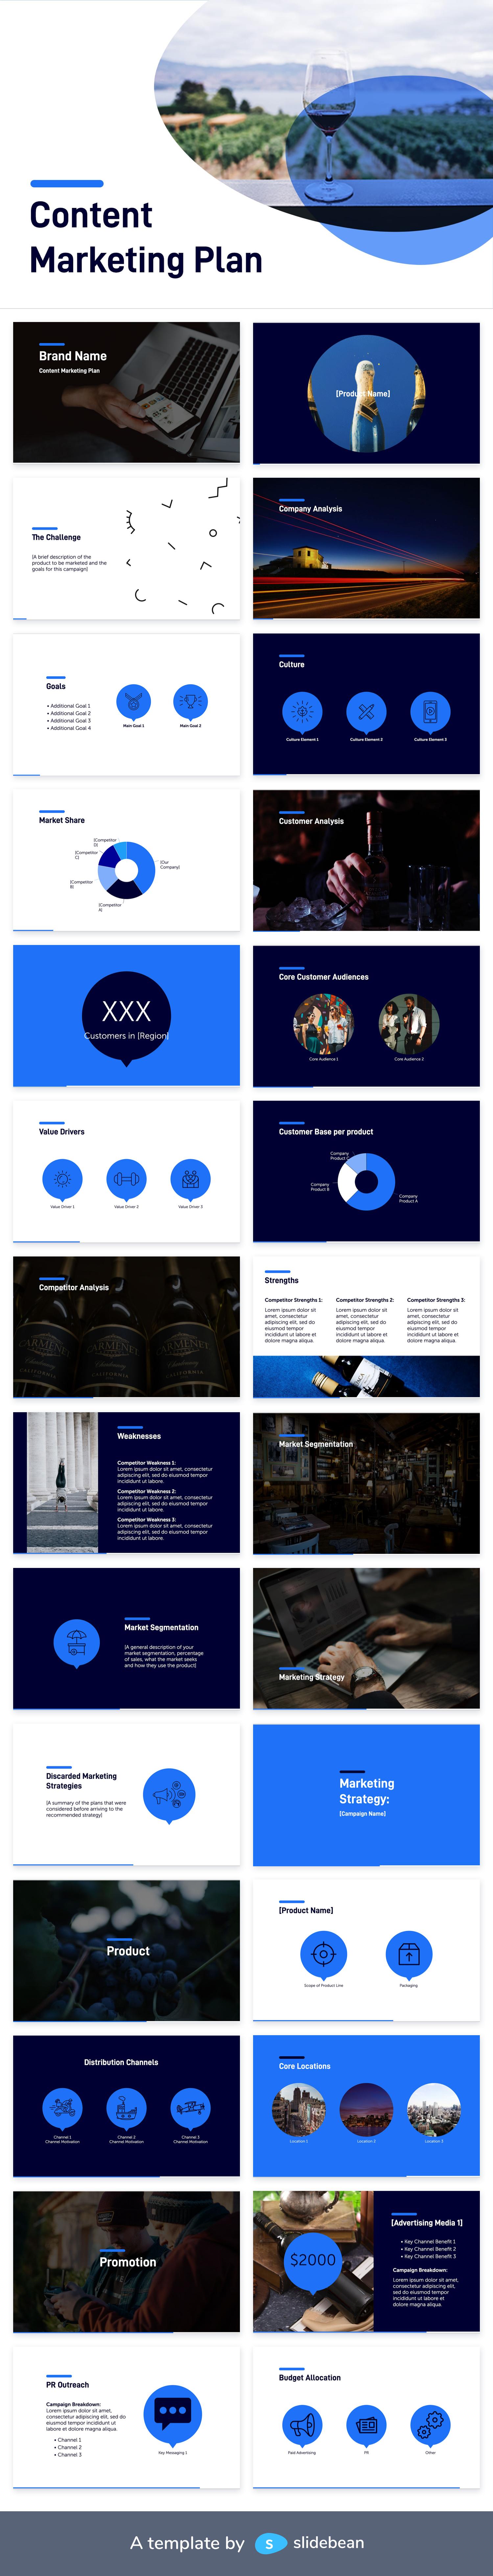 Content Marketing Plan AI Presentation Template